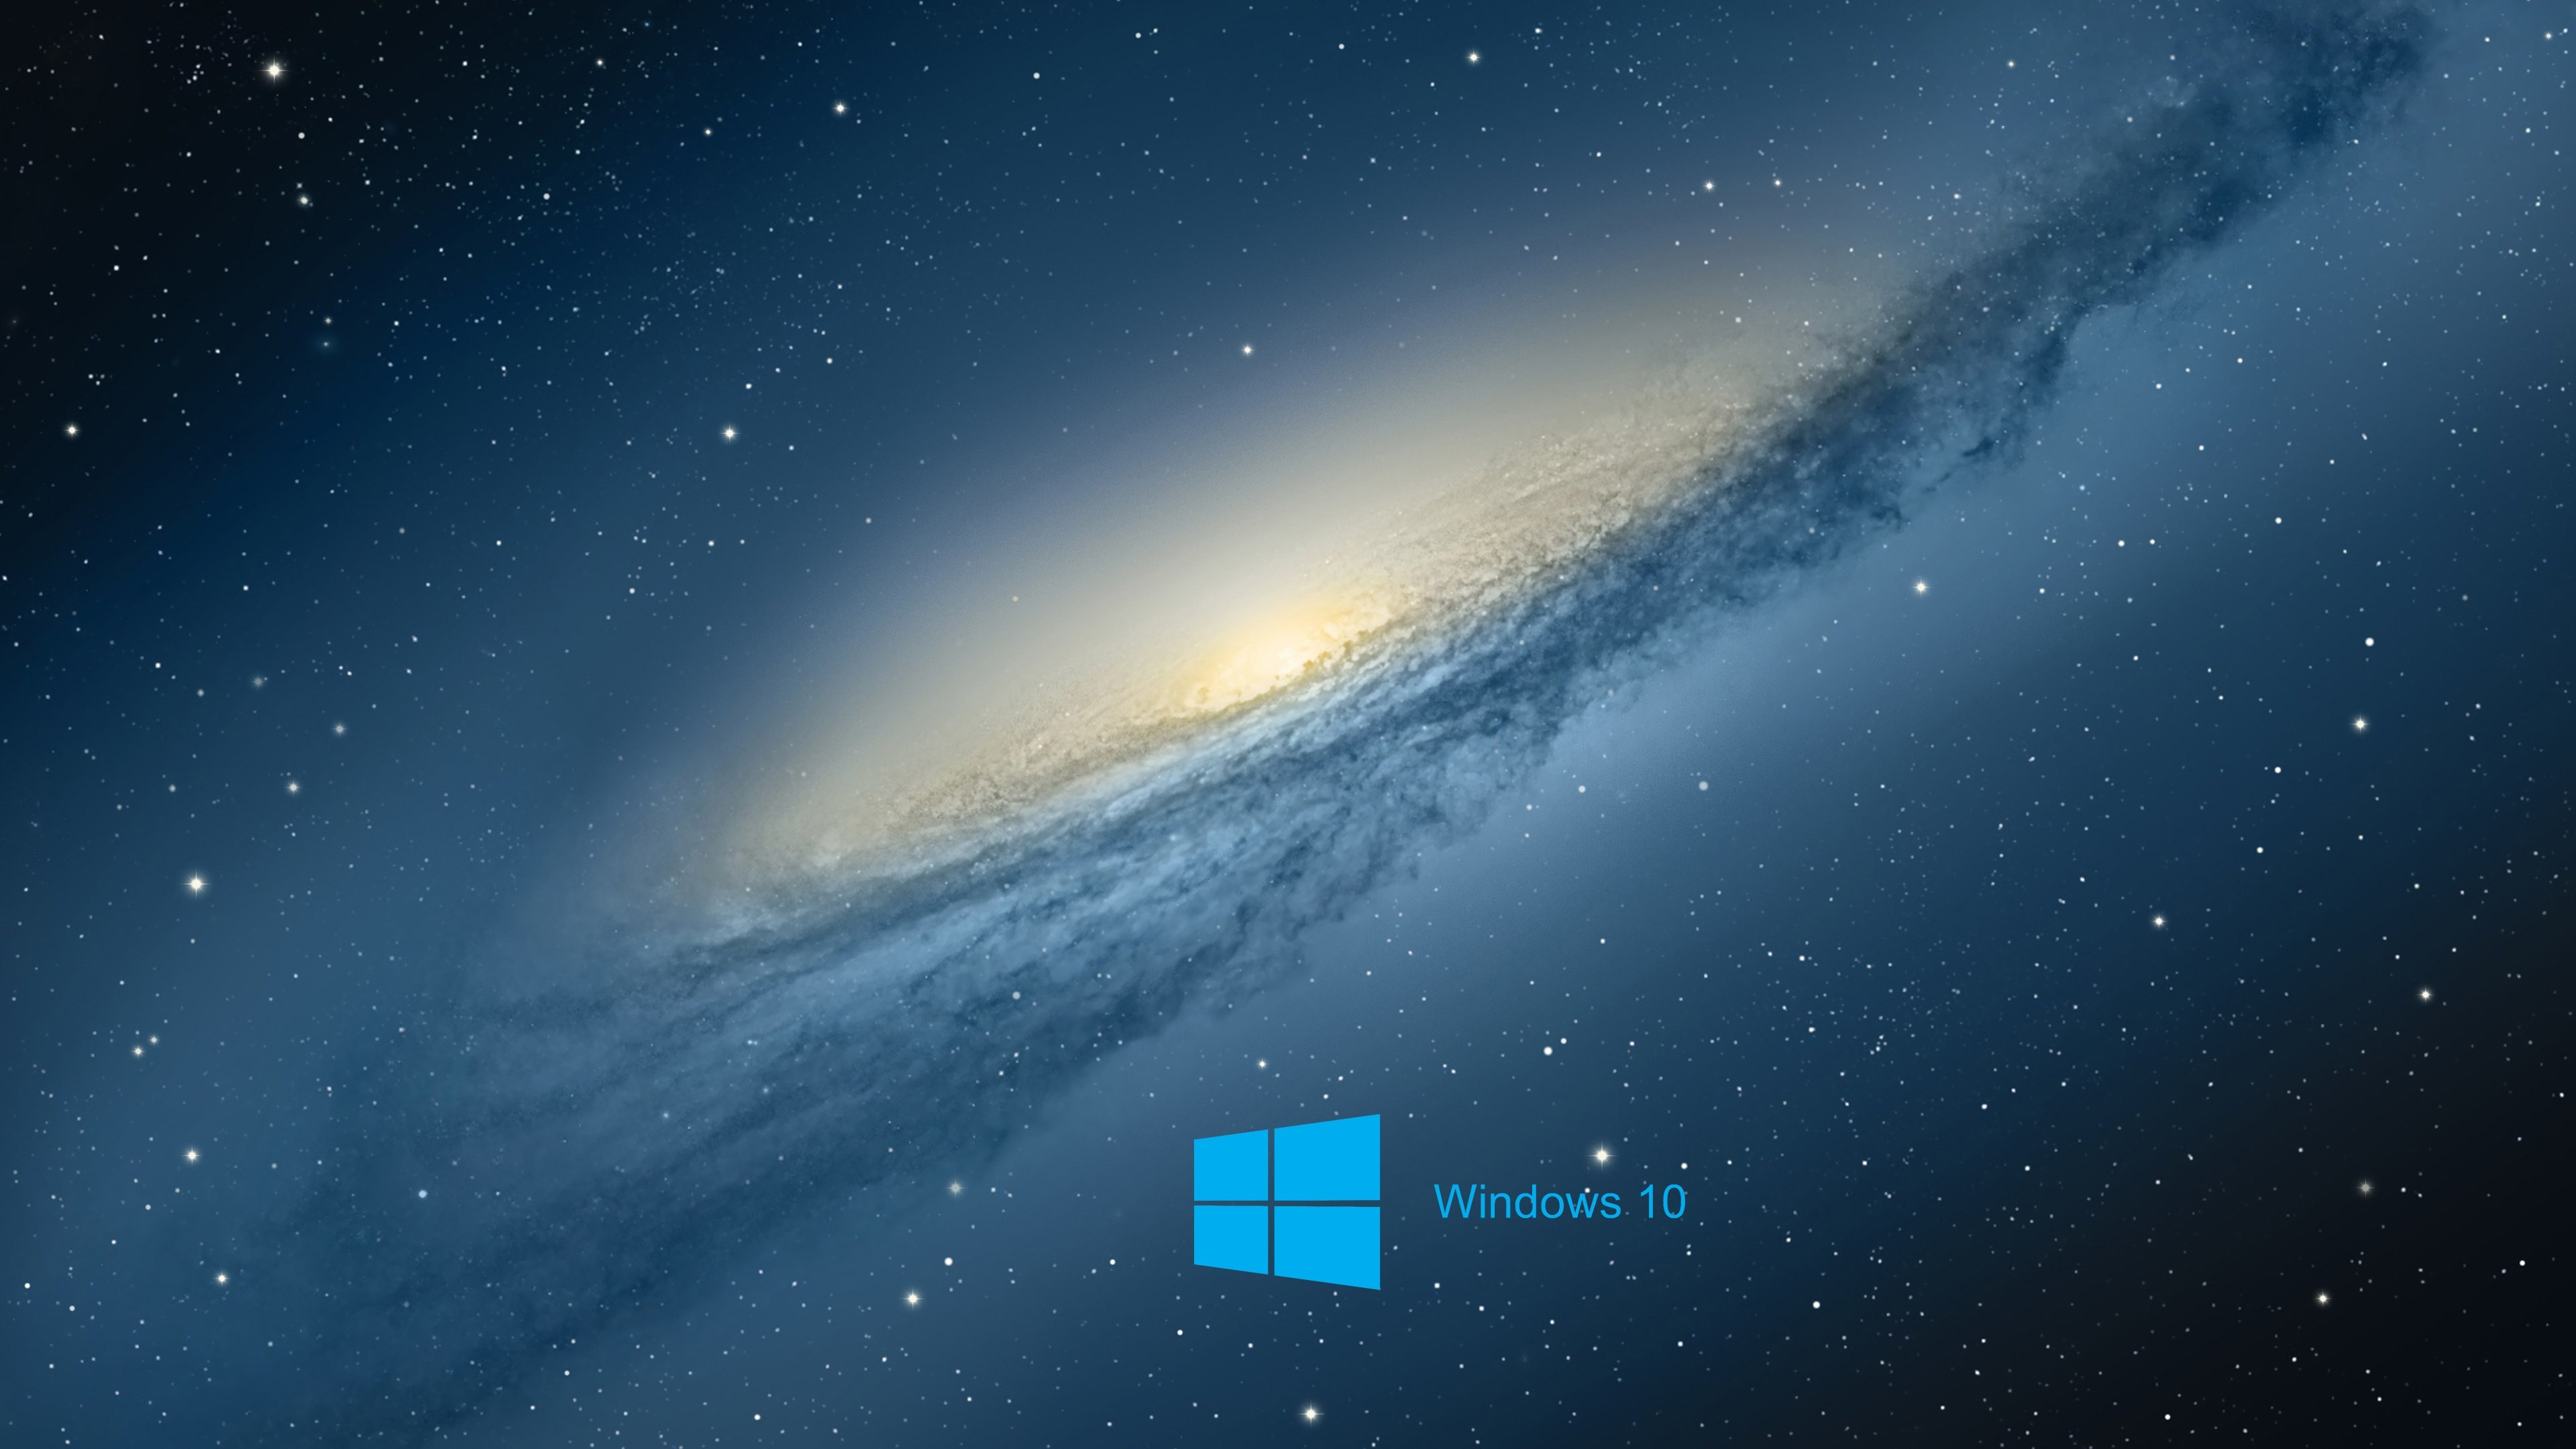 3840x2160 Windows 10 Wallpaper 4k Windows 10 Wallpaper 4k Free